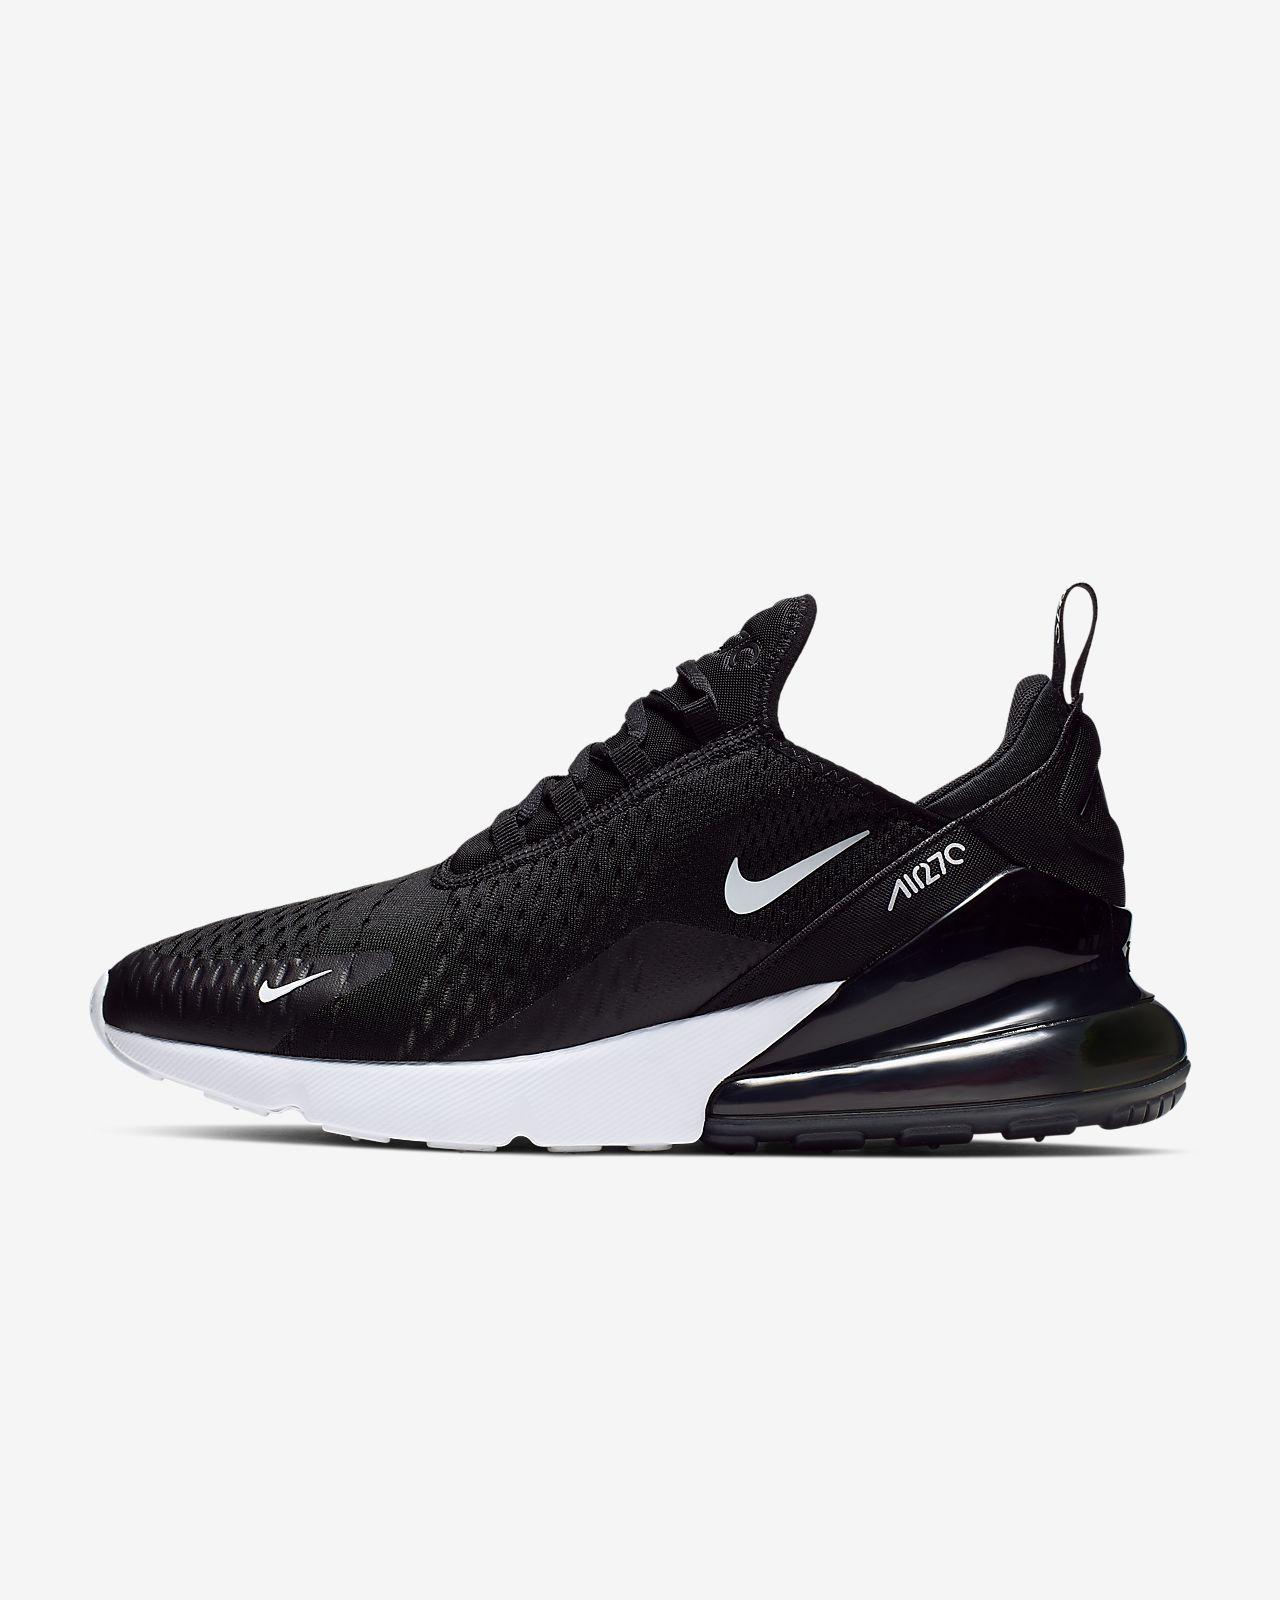 Boys Nike Air Max 270 Lifestyle Shoes Promo BlackRedWhite